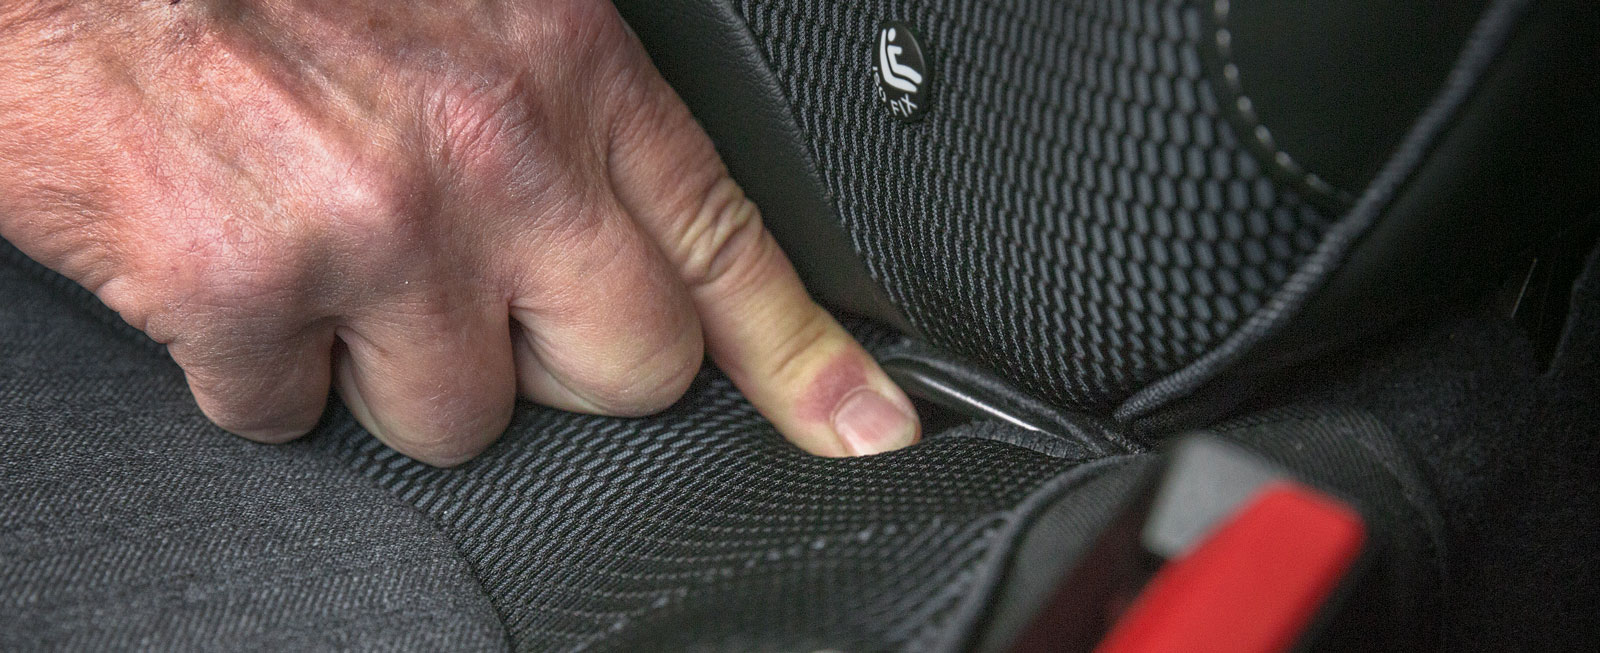 Isofixfästen i passagerarstolen fram standard i Renault. Bravo!